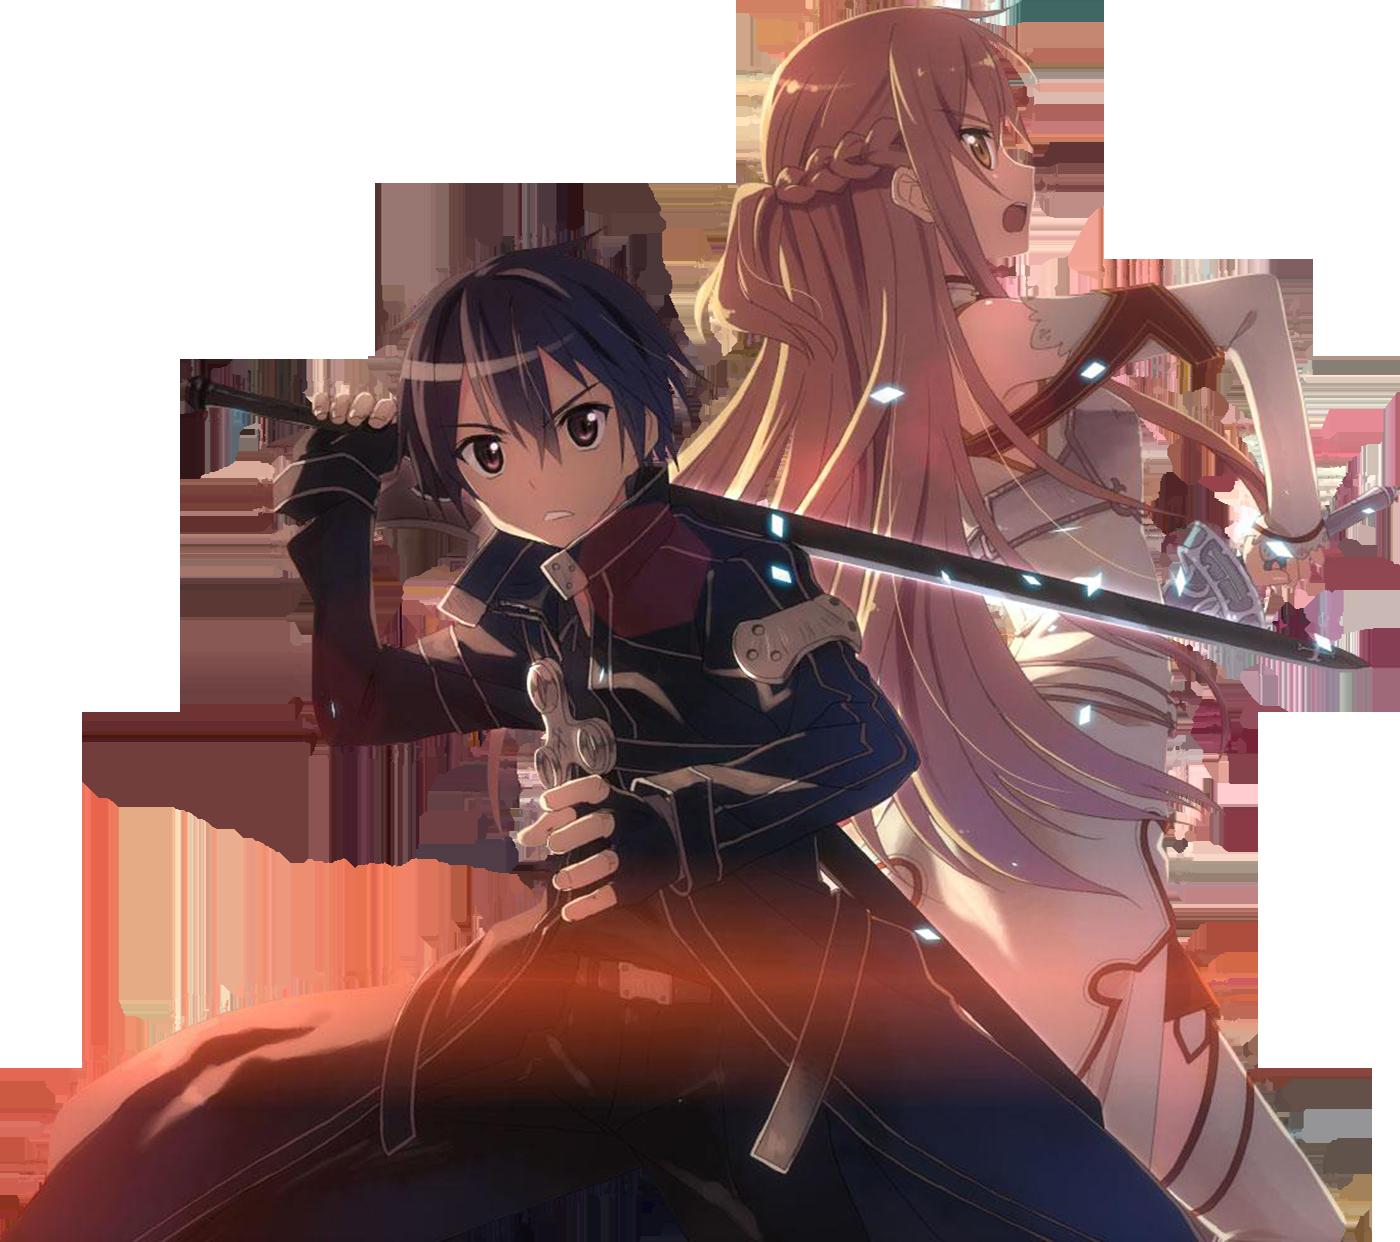 Online Wallpaper: Kirito And Asuna Wallpaper And Background Image